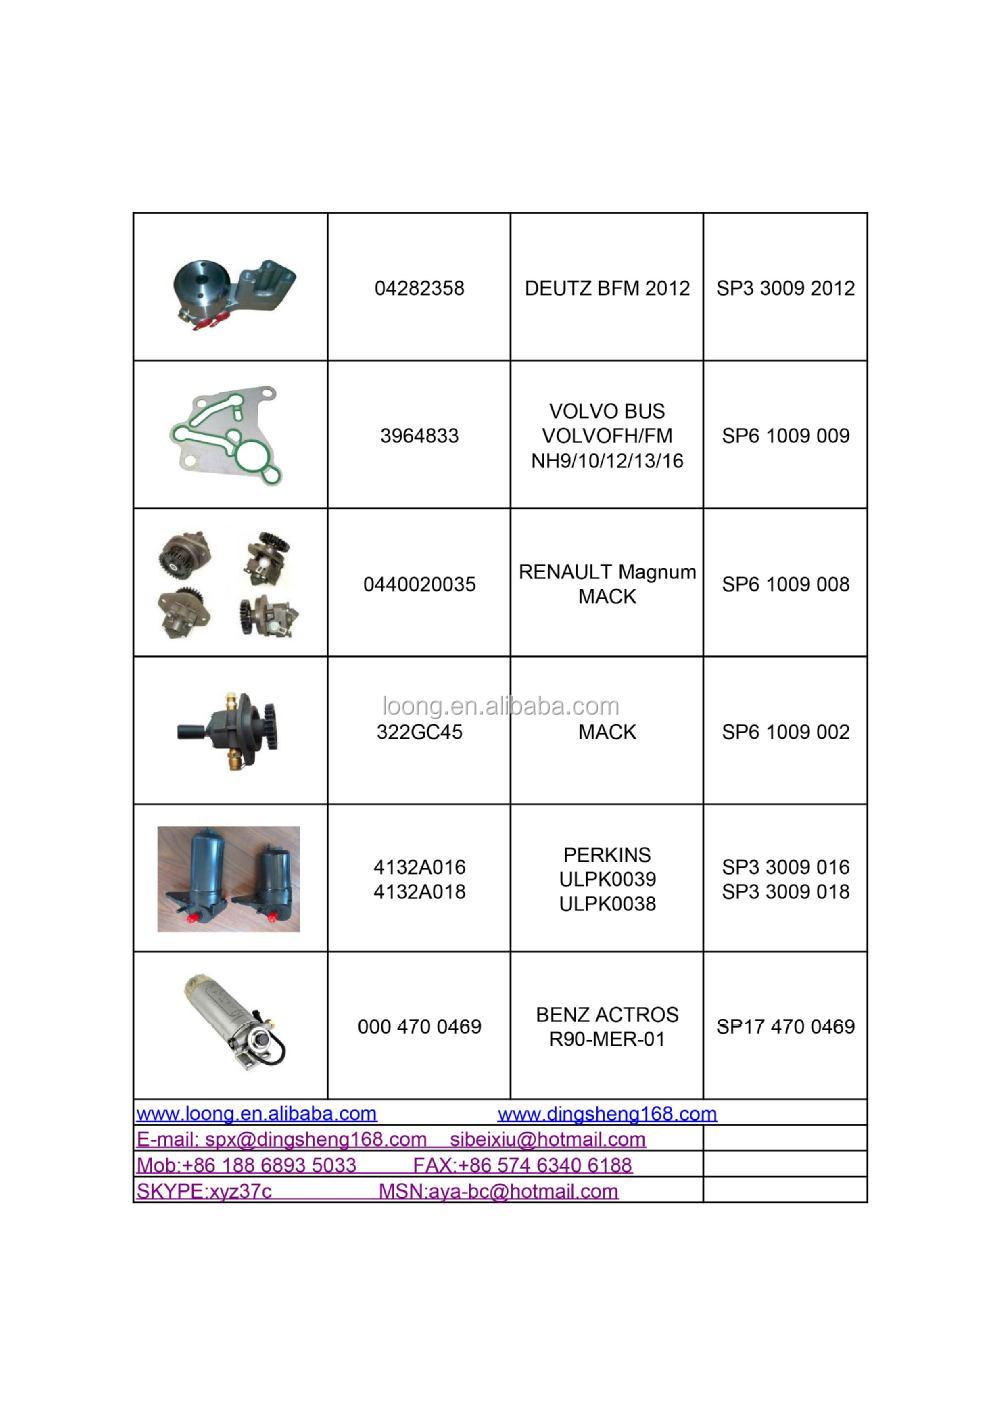 Xvz1300 Wiring Diagram Jaguar Xj6 Engine Diagram – Xvz1300 Wiring Diagram